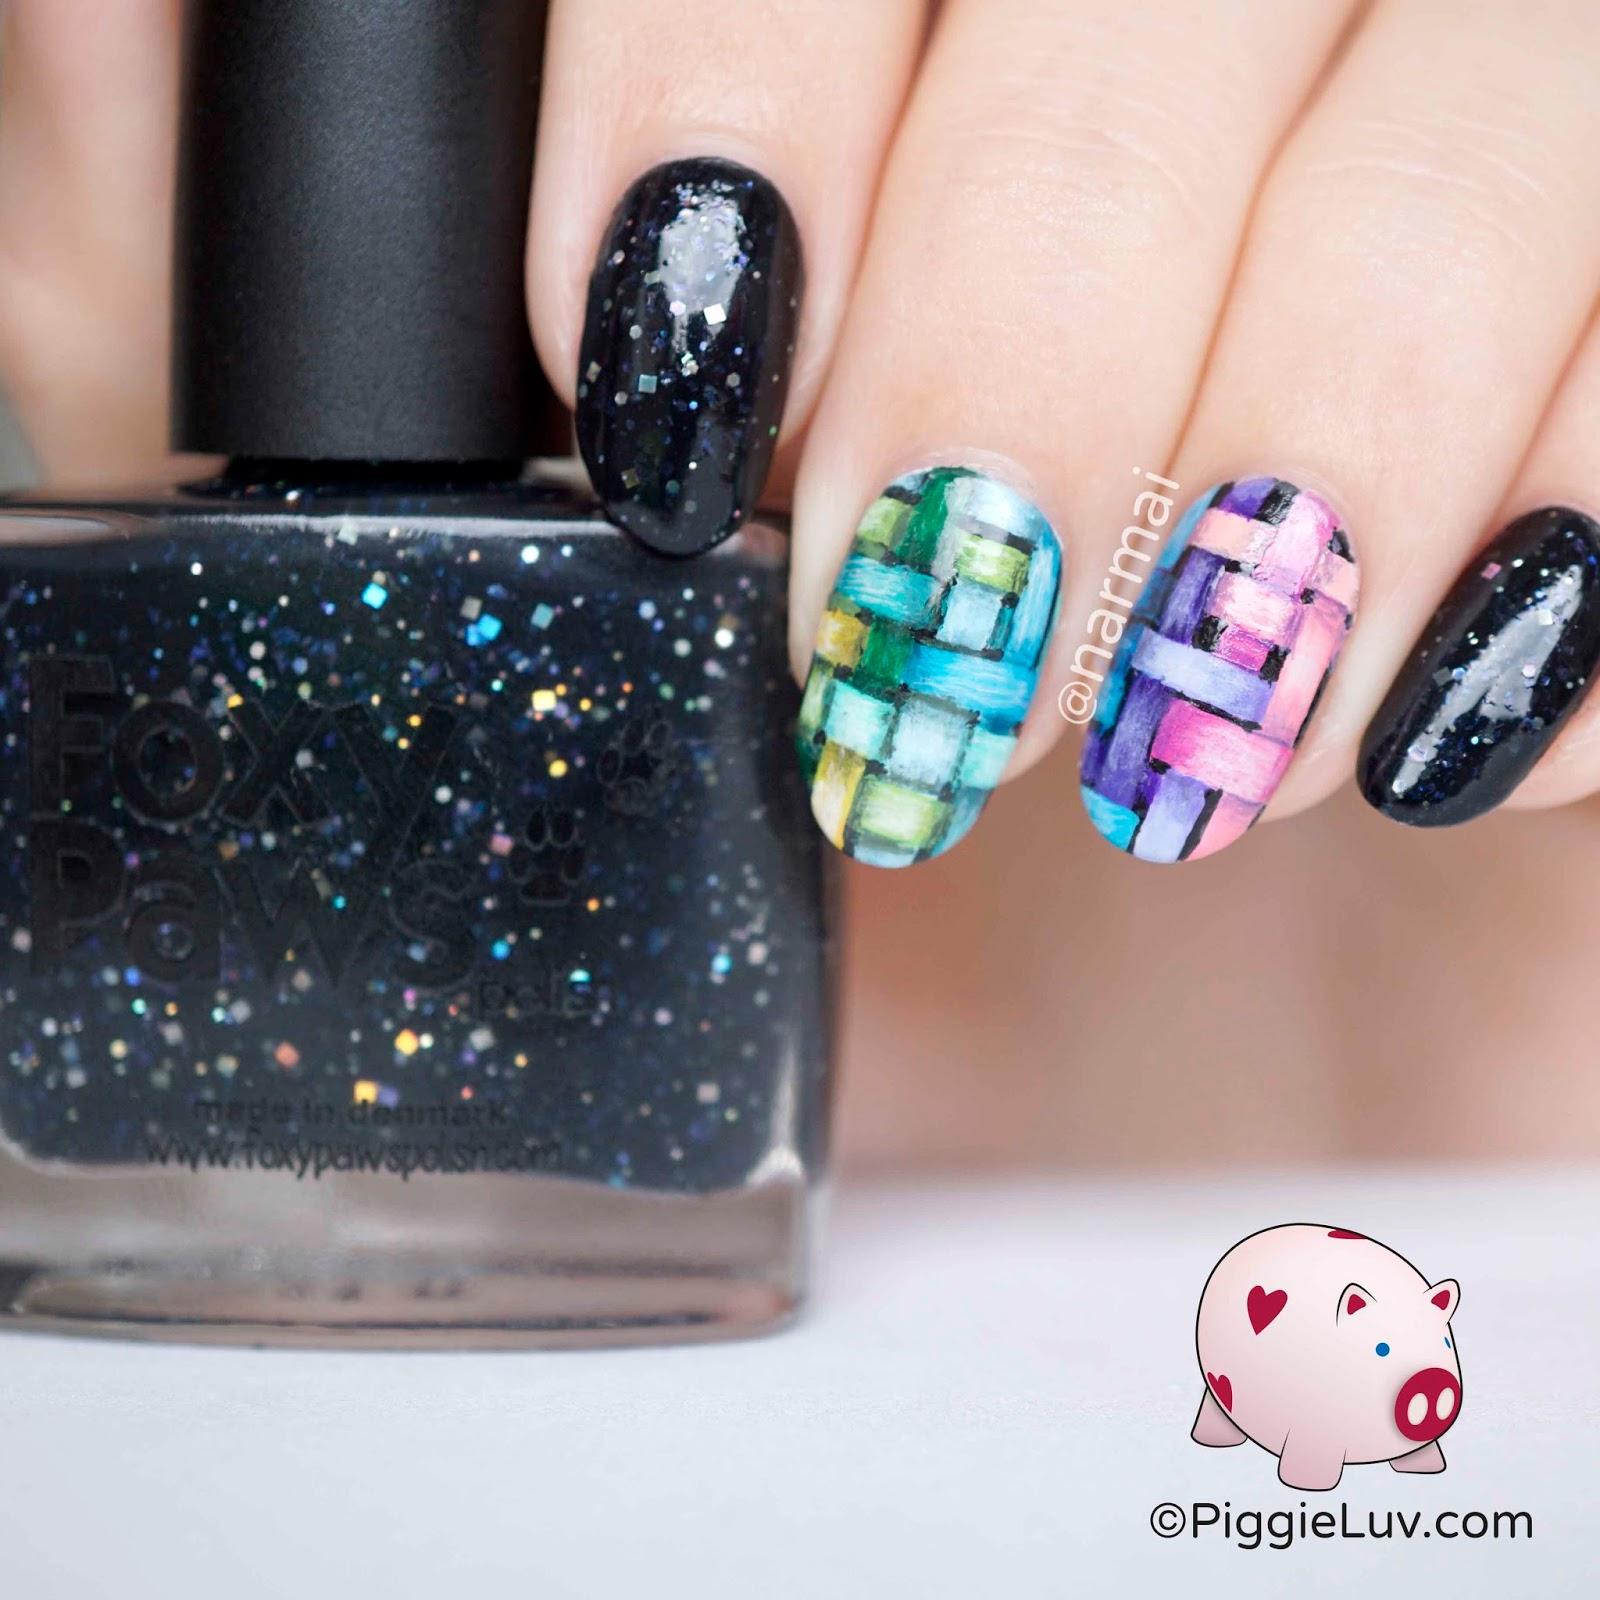 Piggieluv Rainbow Bubbles Nail Art: PiggieLuv: Freehand Woven Rainbow Pattern Nail Art